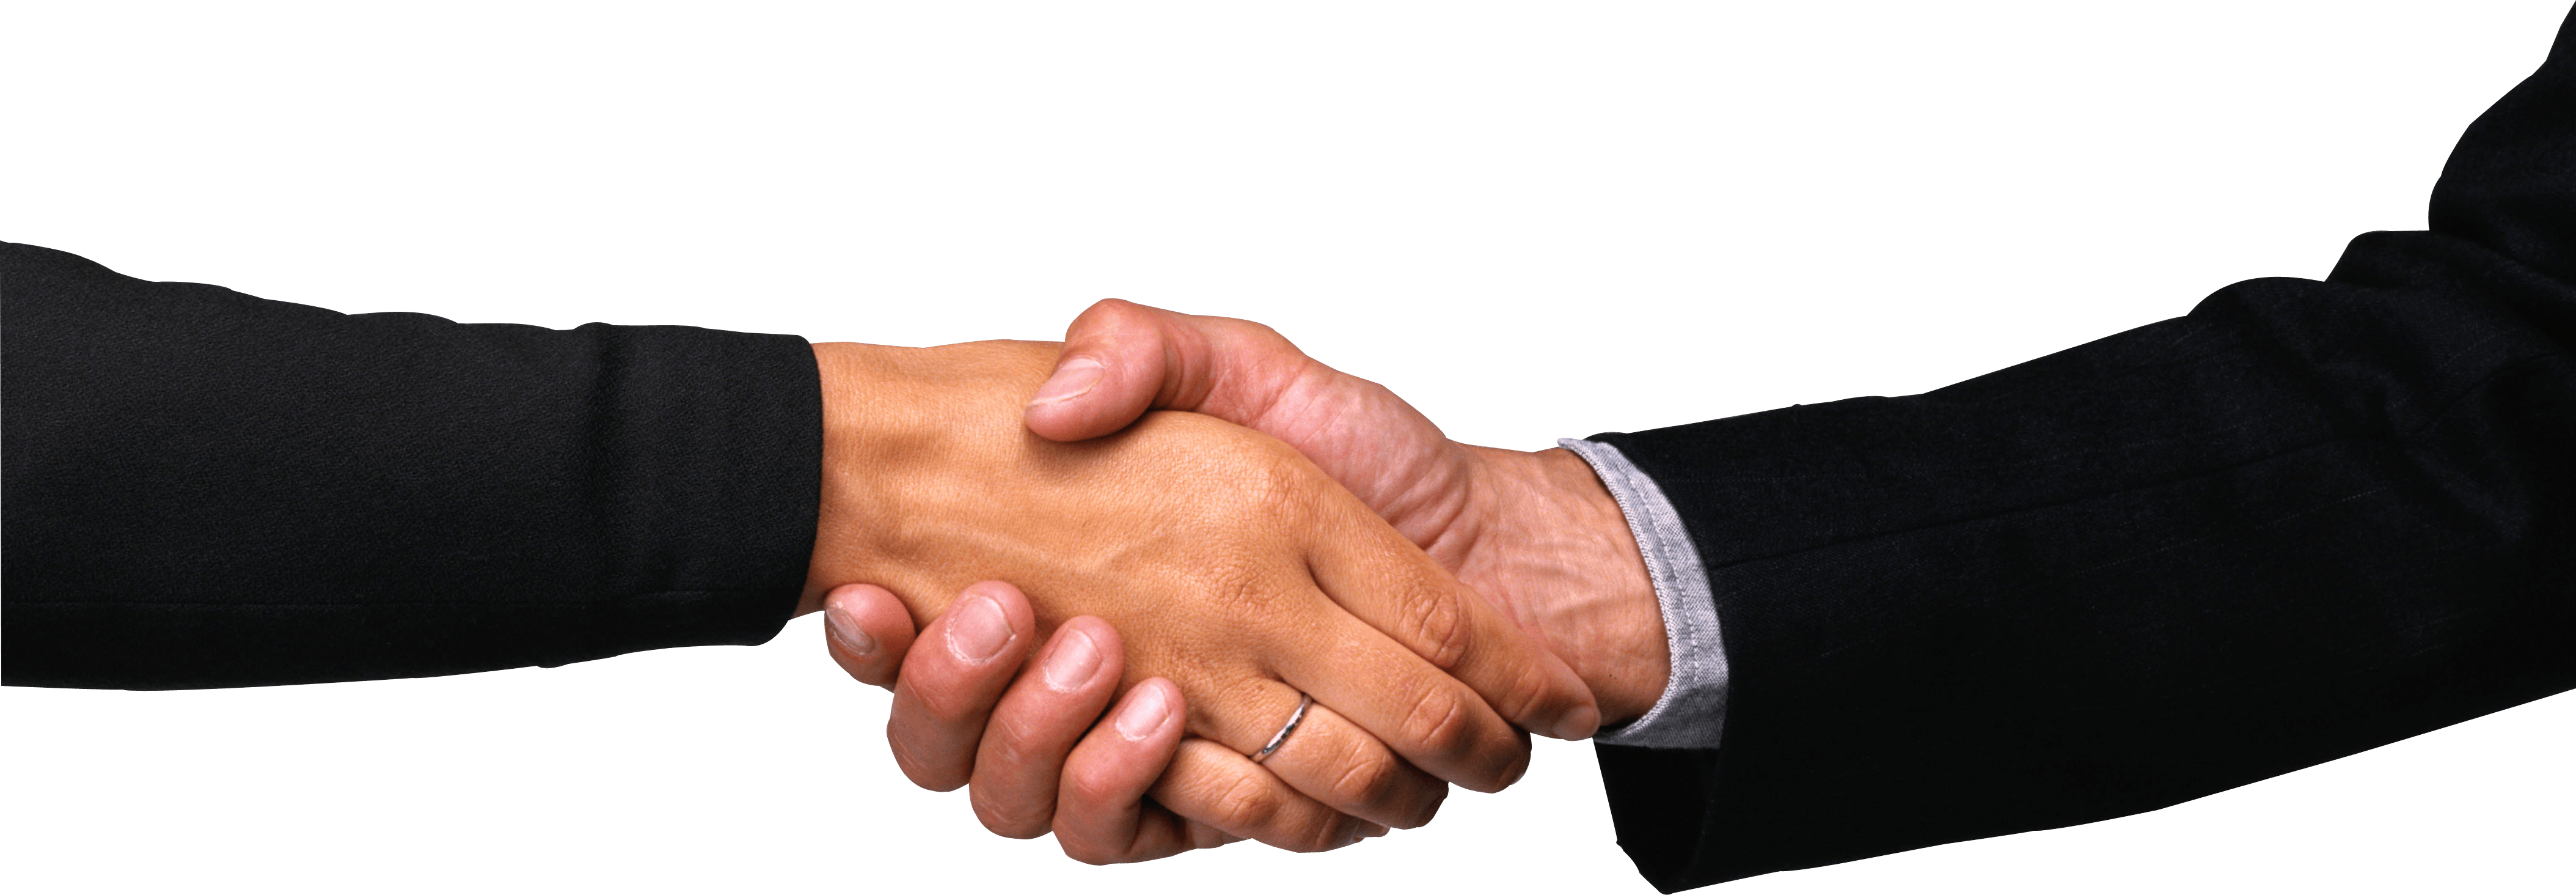 Handshake PNG HD - 129418